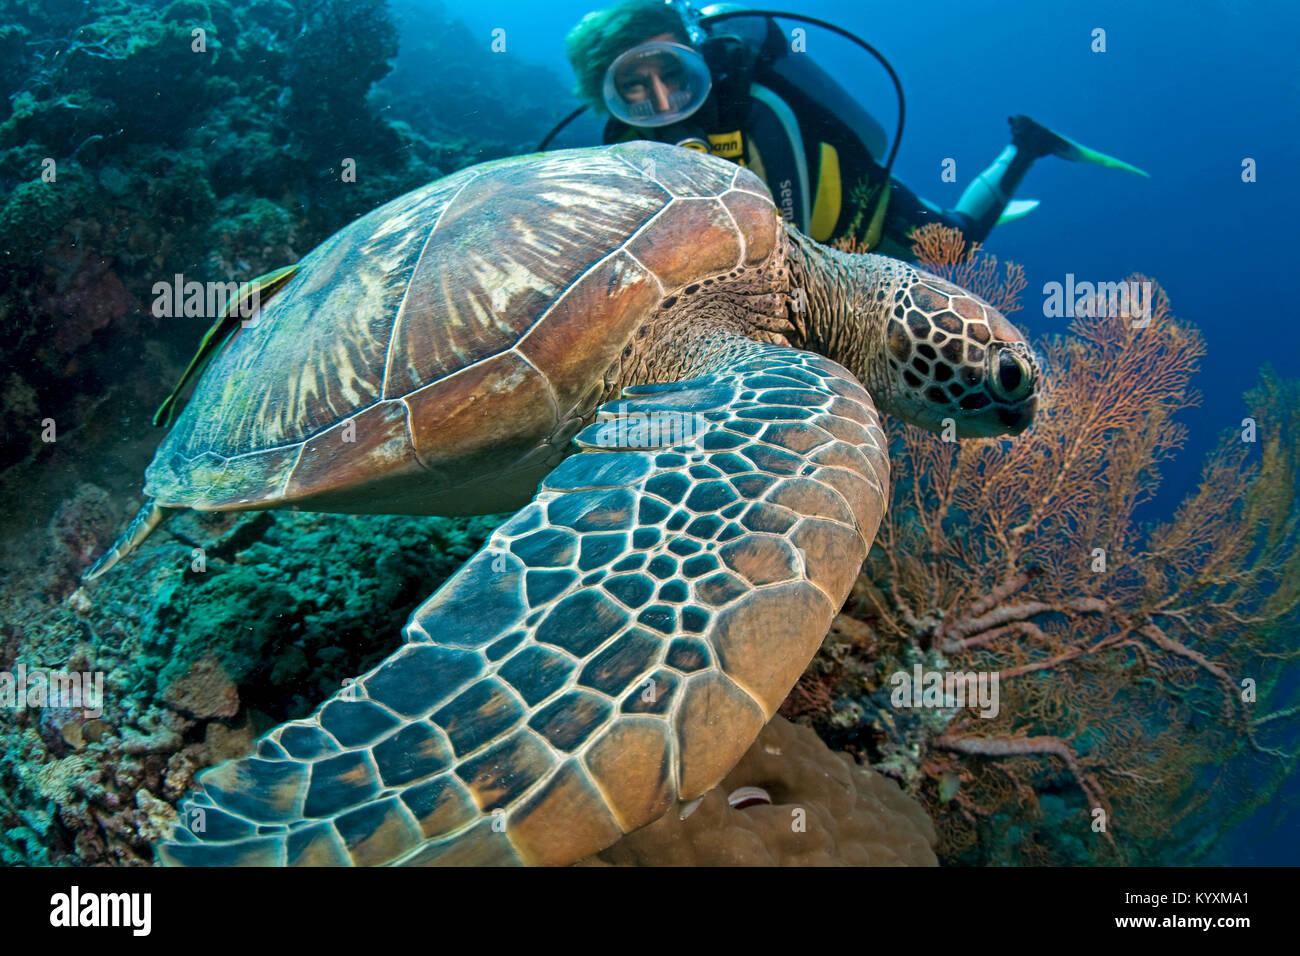 Scuba Diver e la tartaruga verde (Chelonia Mydas), Moalboal, isola di Cebu, Filippine, Asia Immagini Stock